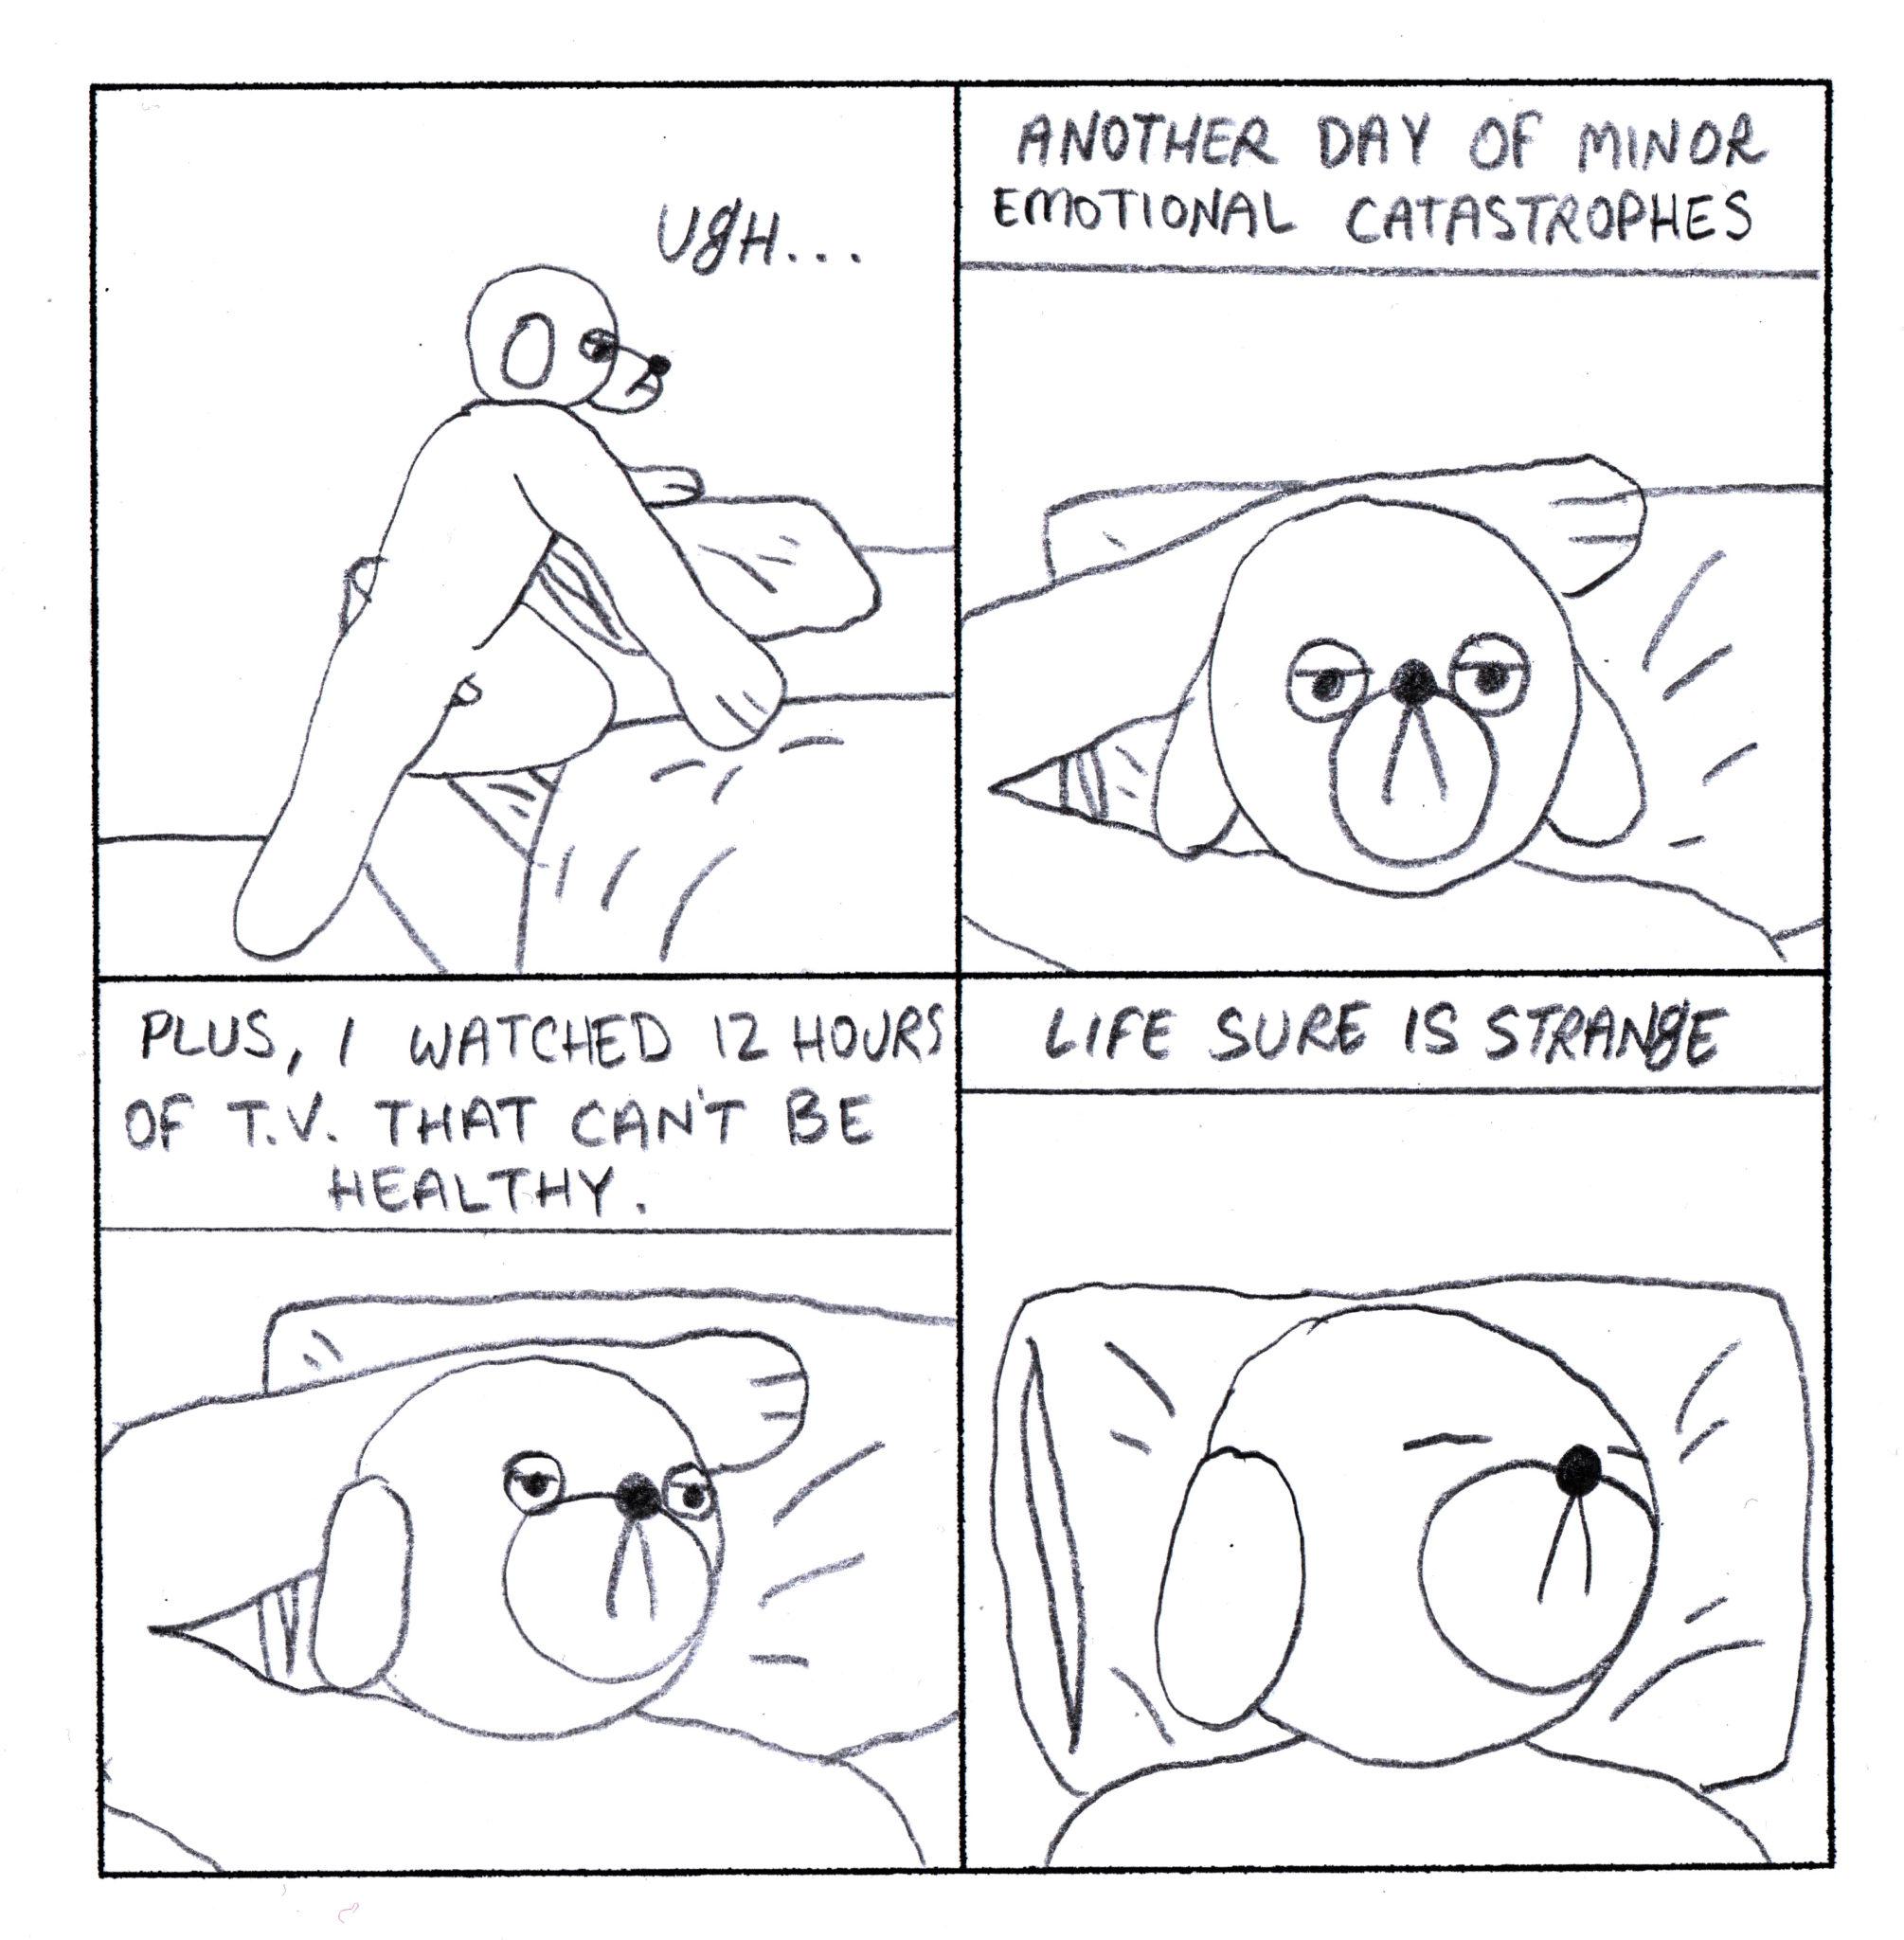 Dog Comics 121-130 - Page 1